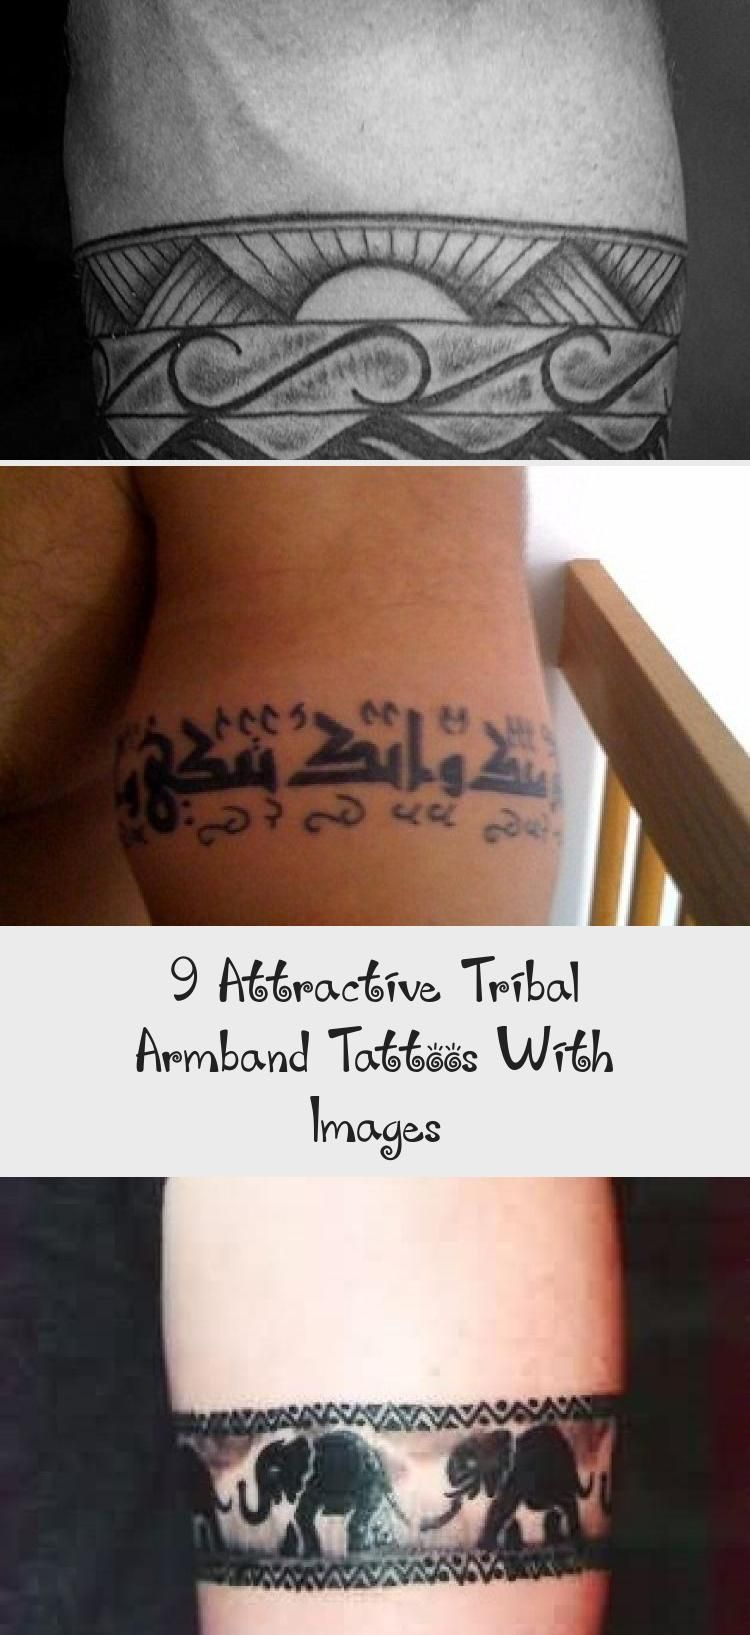 9 Attractive Tribal Armband Tattoos With Images Vikingarmtattoosformen Armtattoosformenunique Flowerarm In 2020 Tribal Armband Tattoo Tribal Armband Arm Band Tattoo